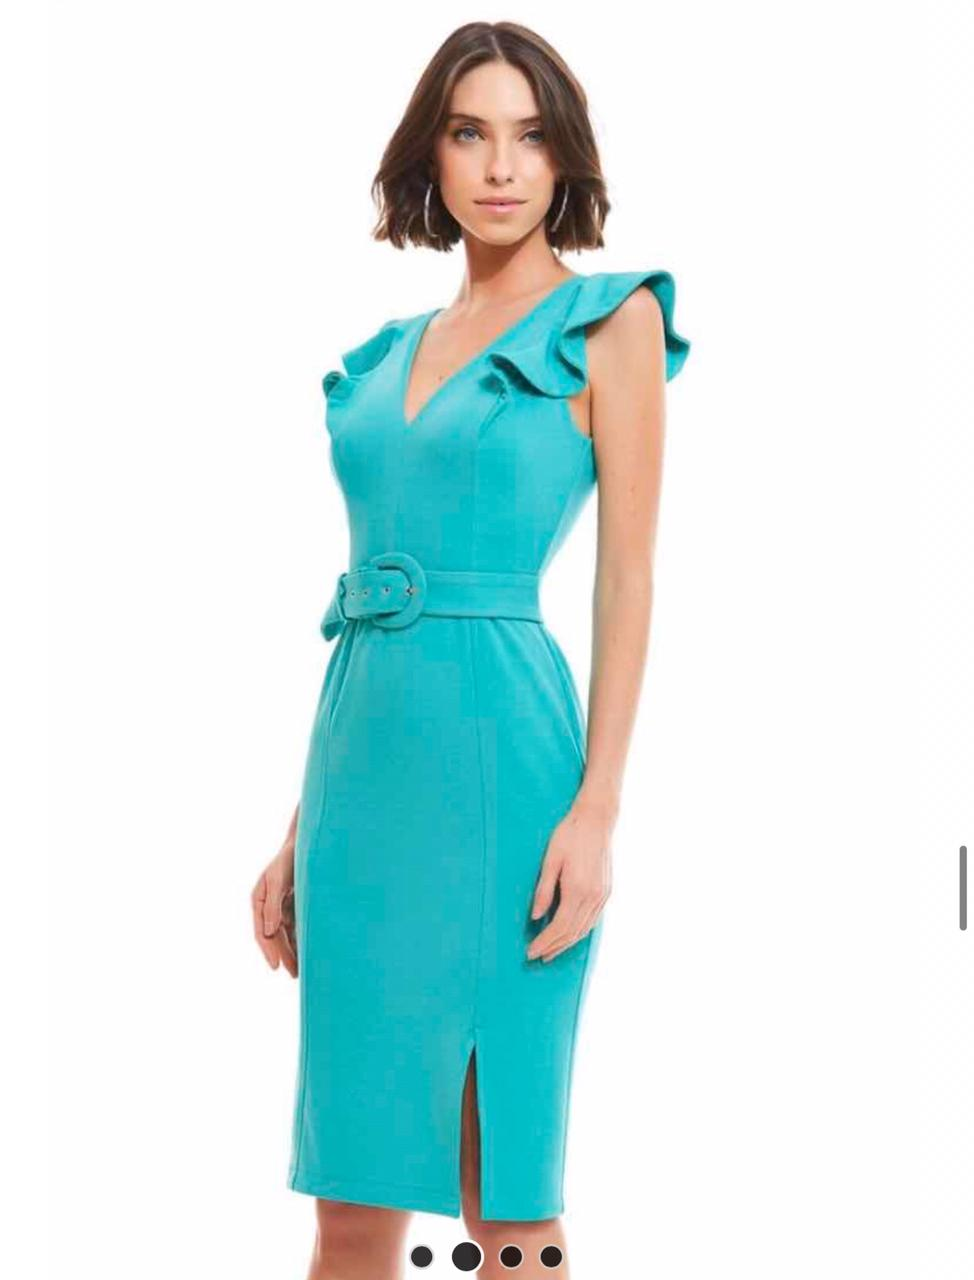 Vestido Milena Crepe  Alfaiataria Midi + Cinto 4% Elastano